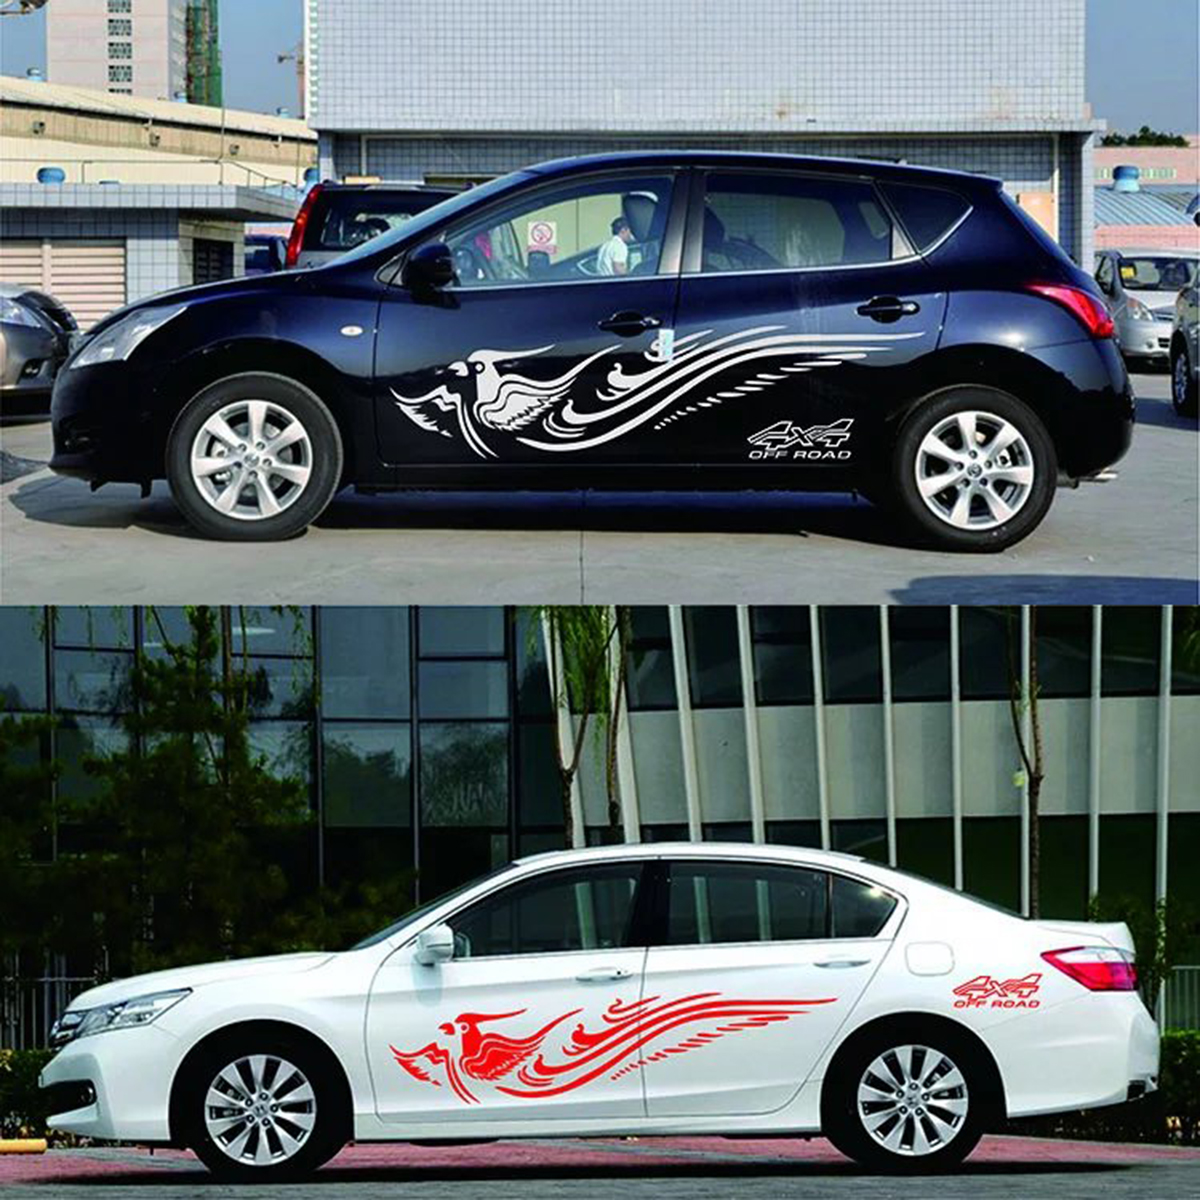 Car body sticker design for sale - Car Truck Flying Phoenix Graphics Vinyl Body Decal Side Animal Hood Sticker Phoenix Car Stickers For